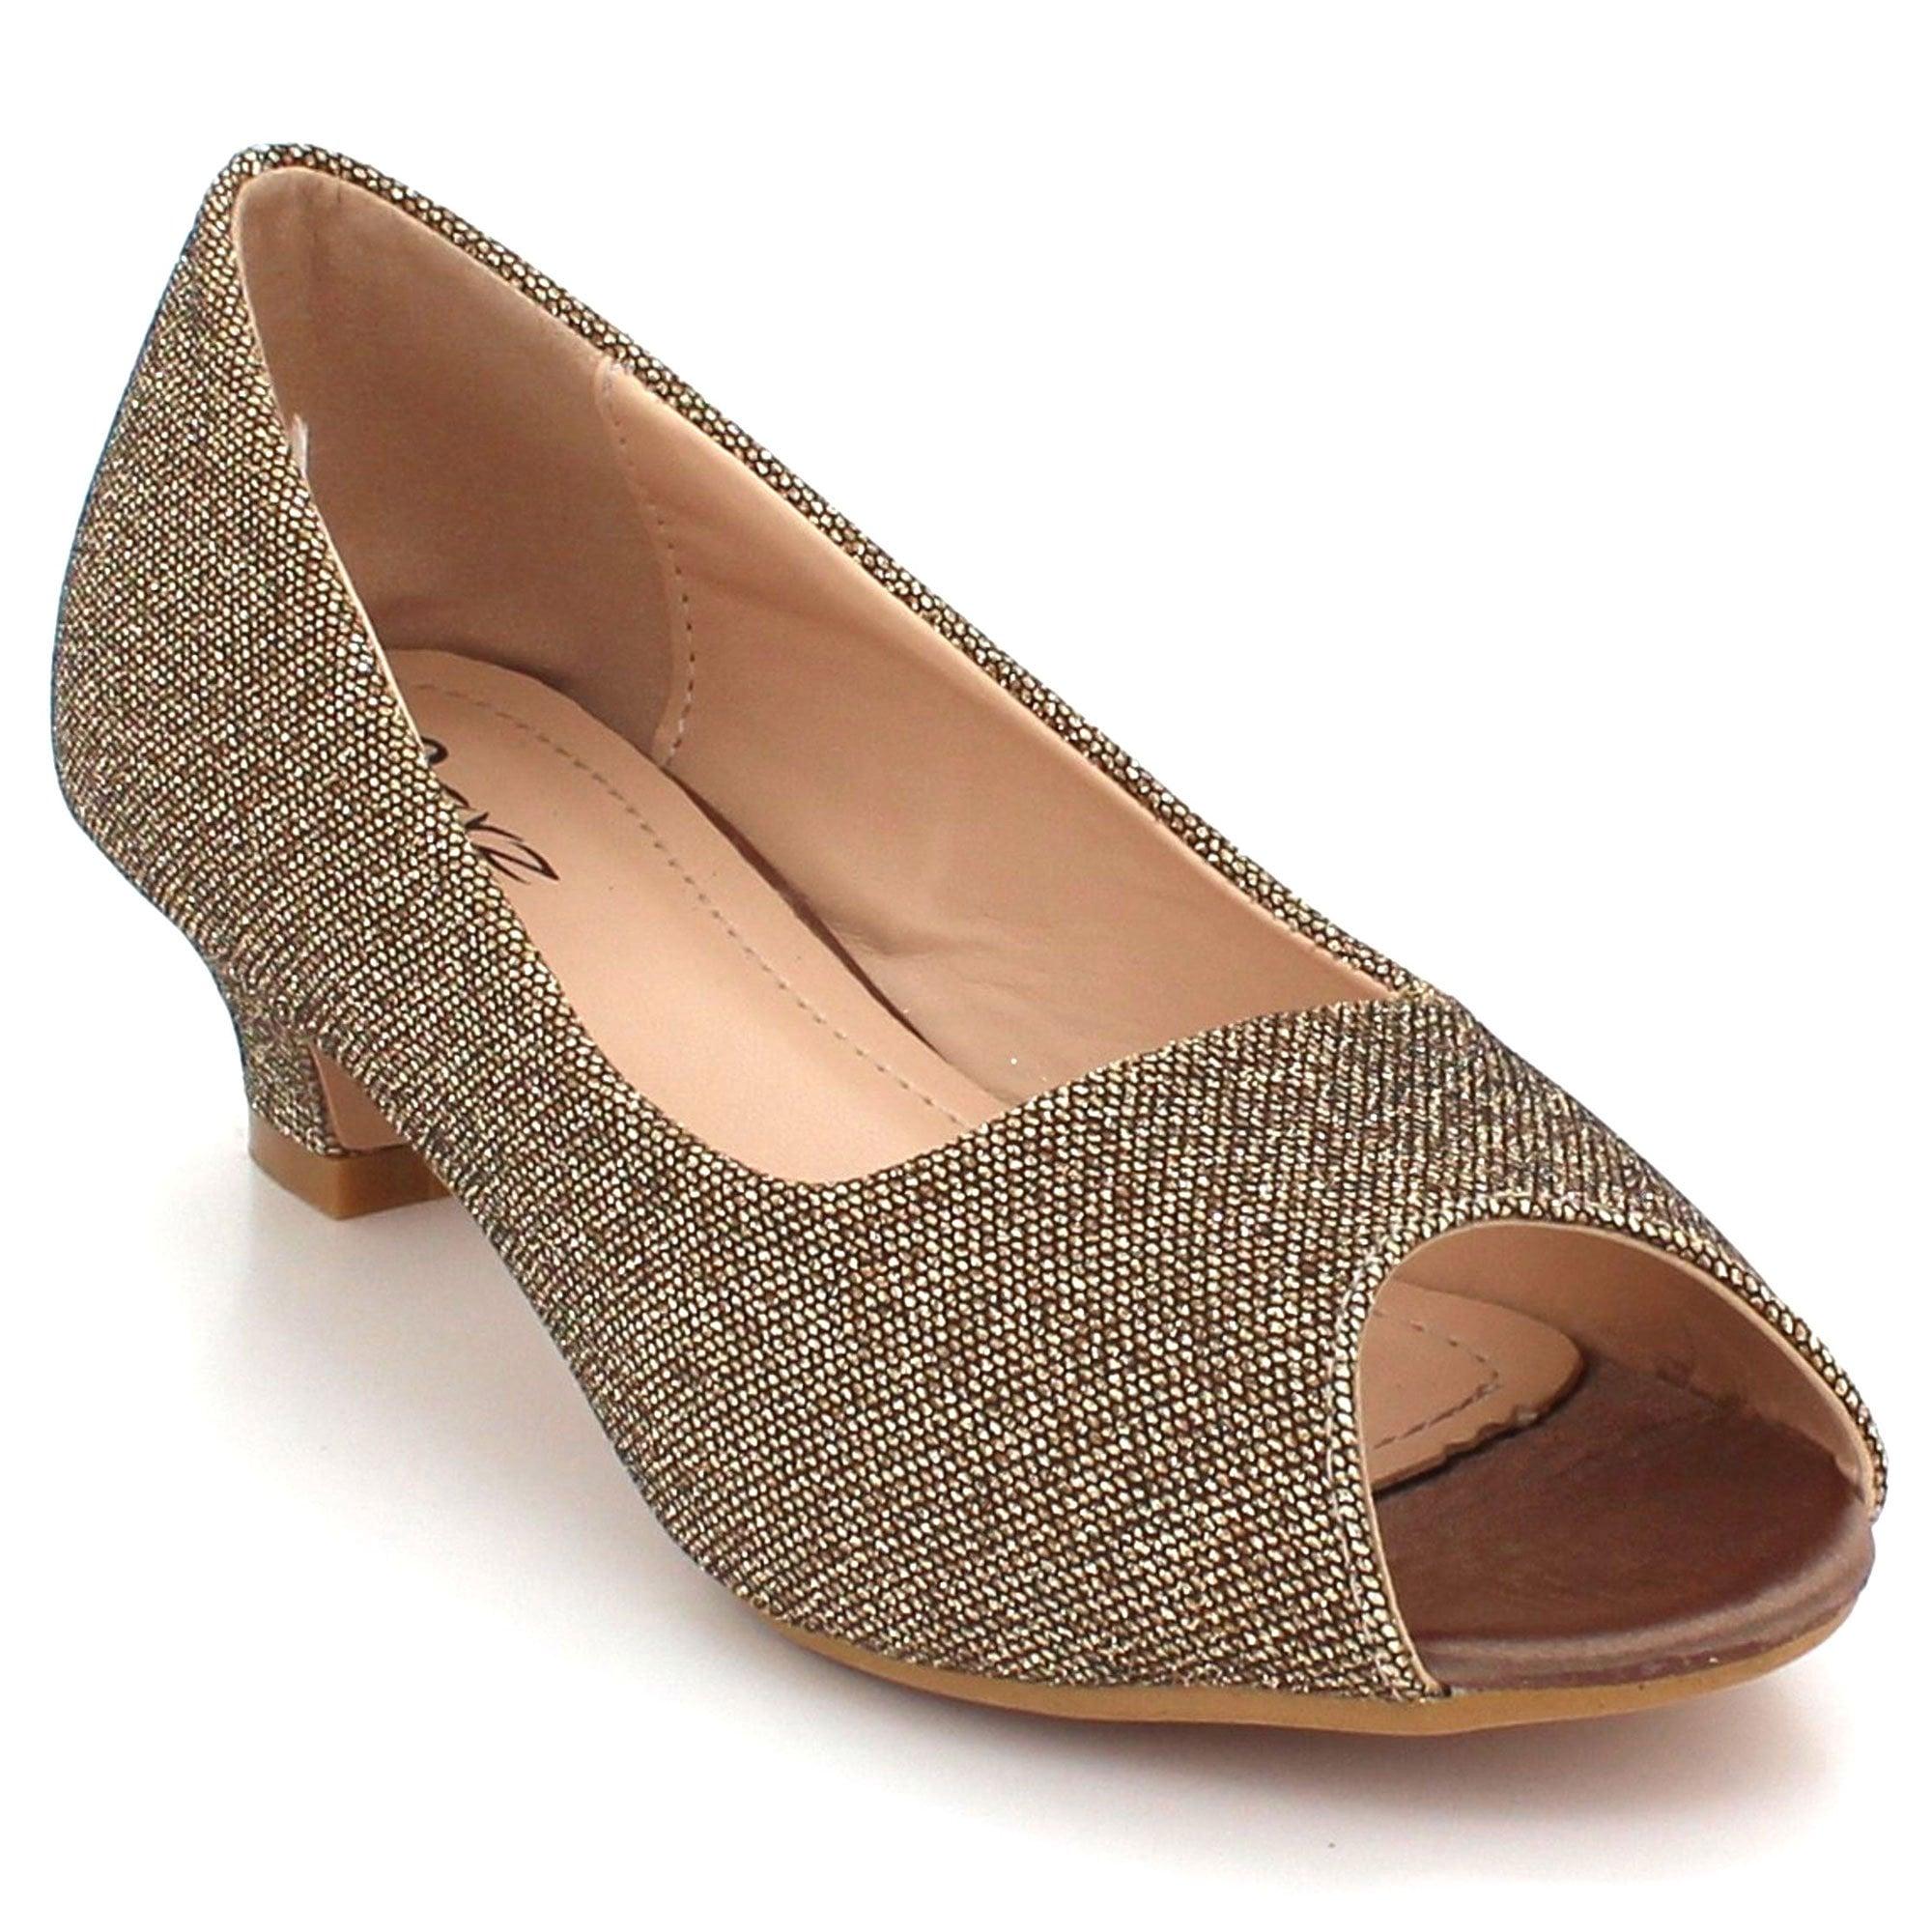 3734b8ed3c4 Aarz London Anora- Glitter Peep-toe Shoes